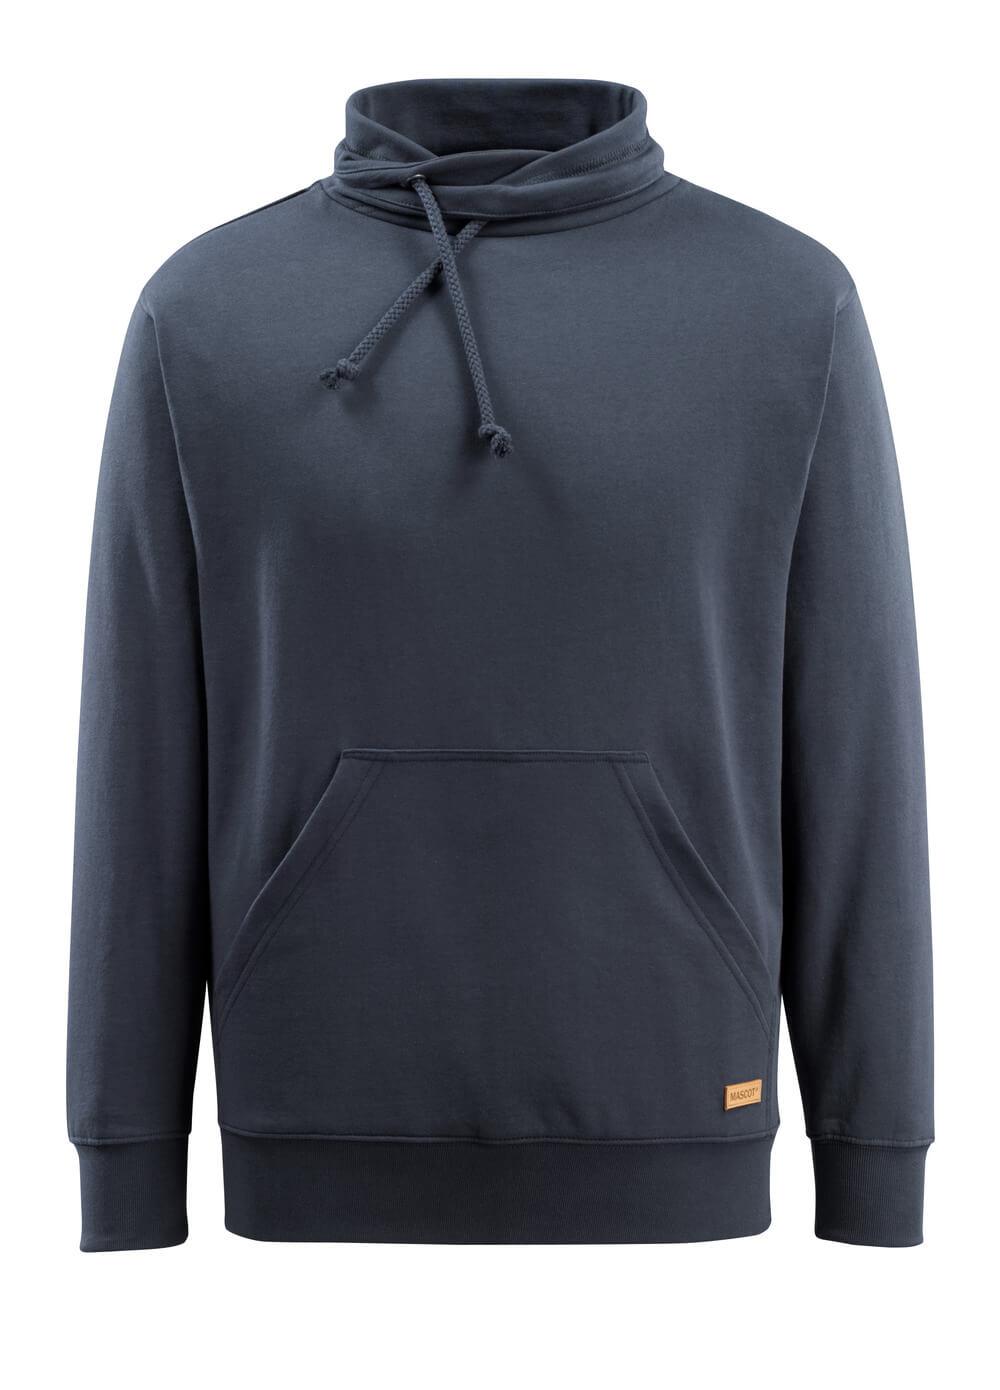 50598-280-010 Sweatshirt - dark navy